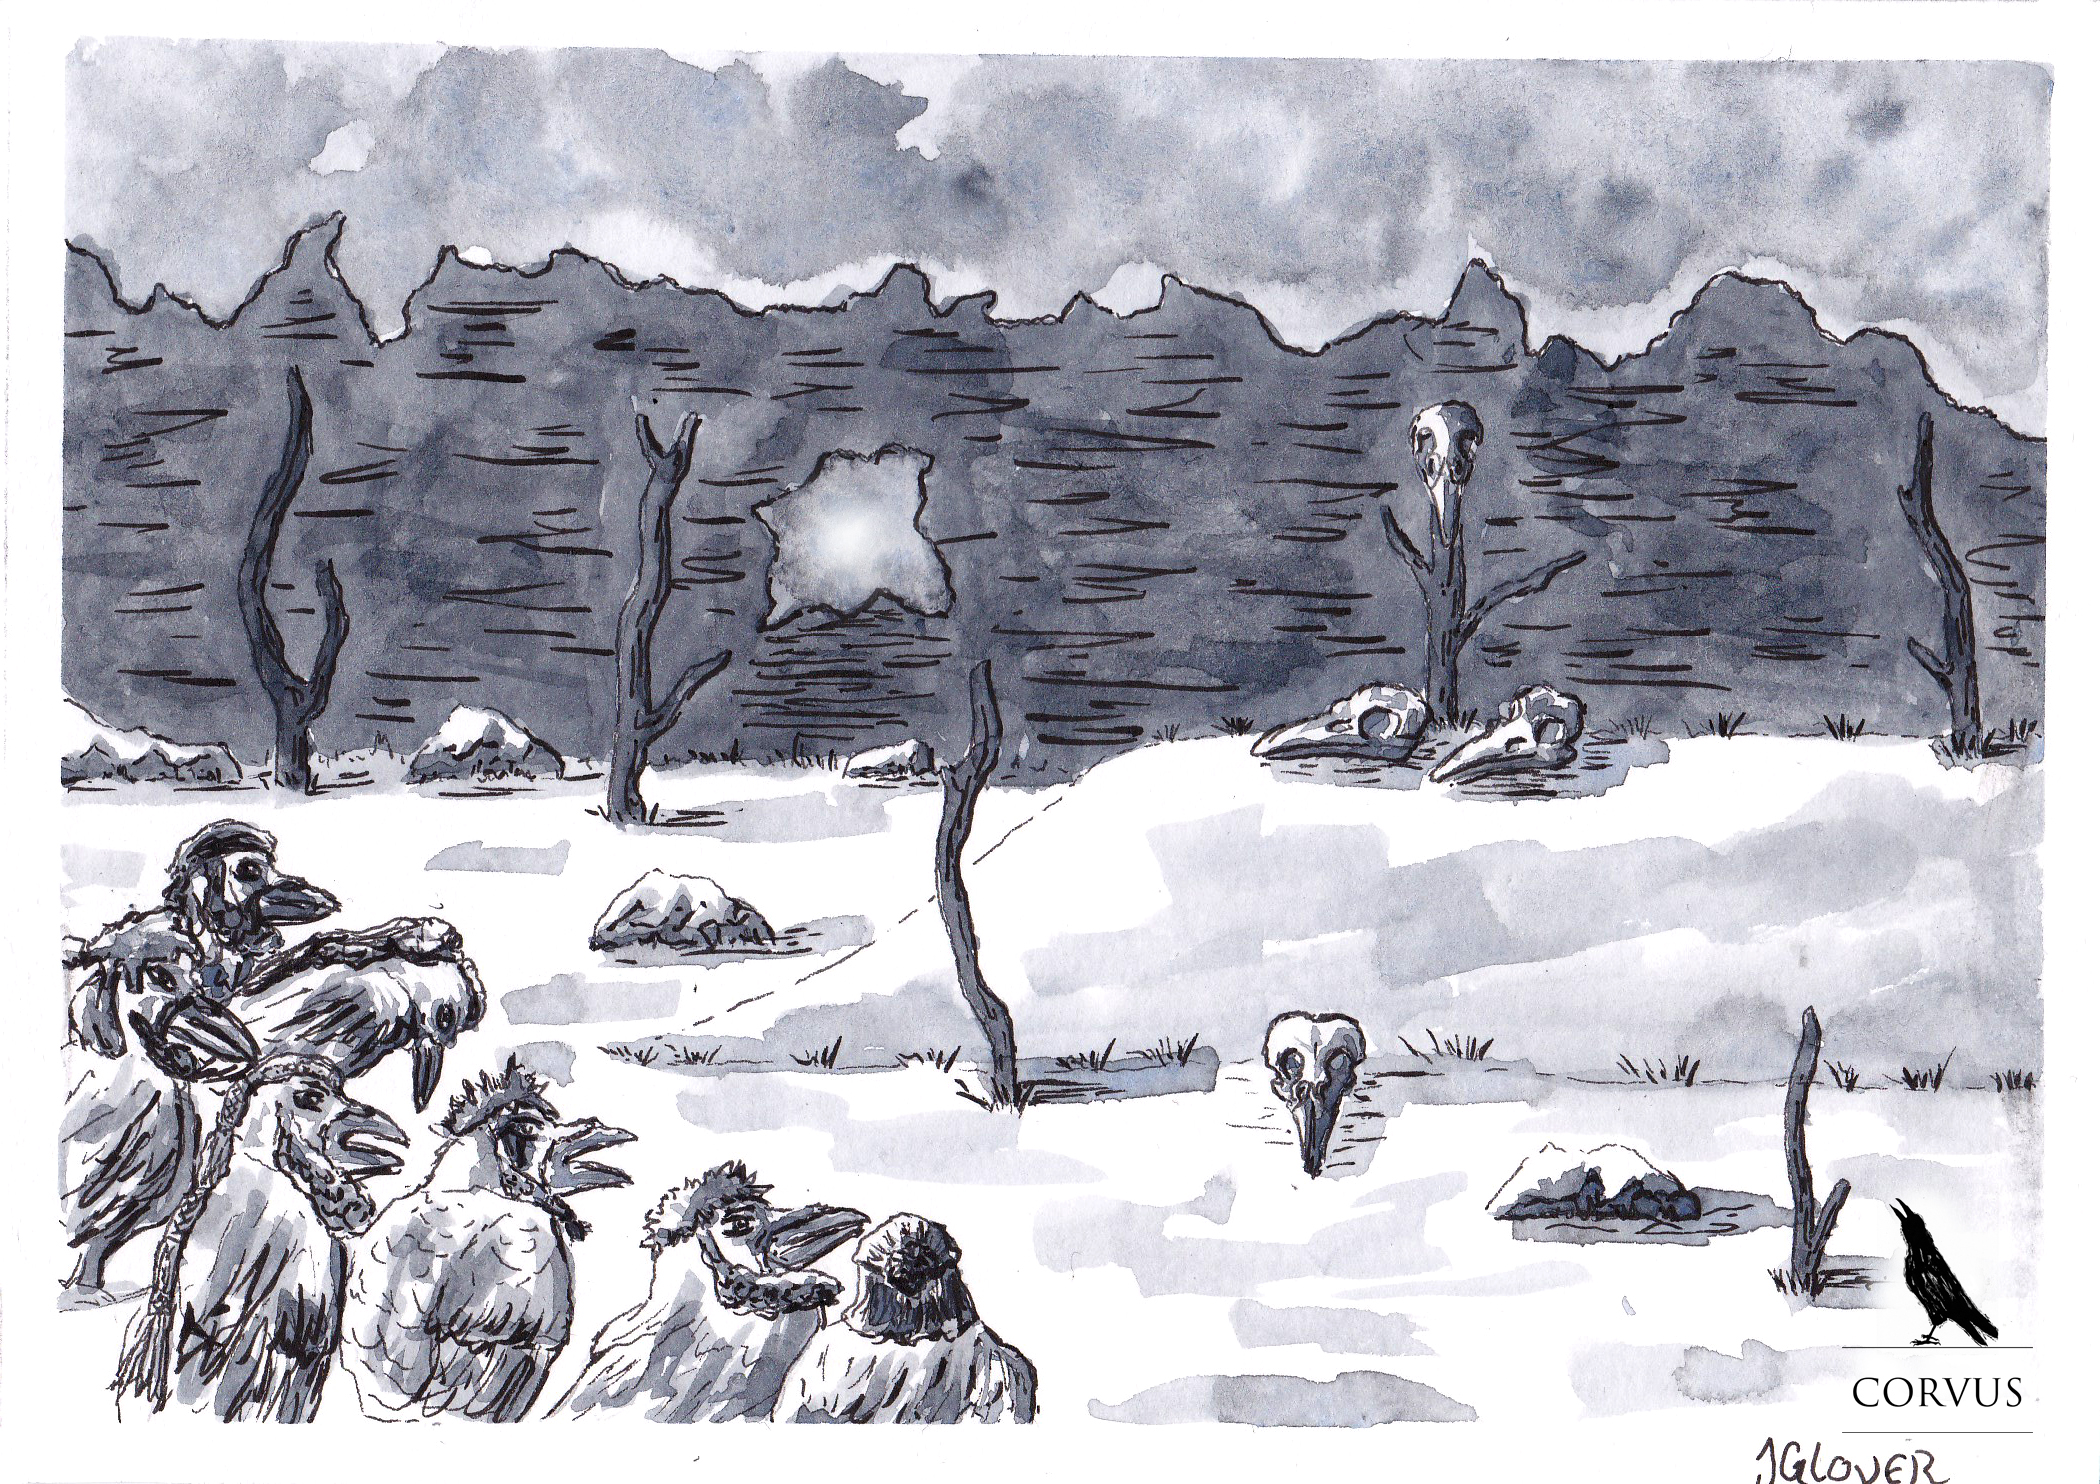 Corvus - Art - Illustration - Graphic Novel - Webcomic - Ink - Drawing - Inktober - Story - Raven - Crow